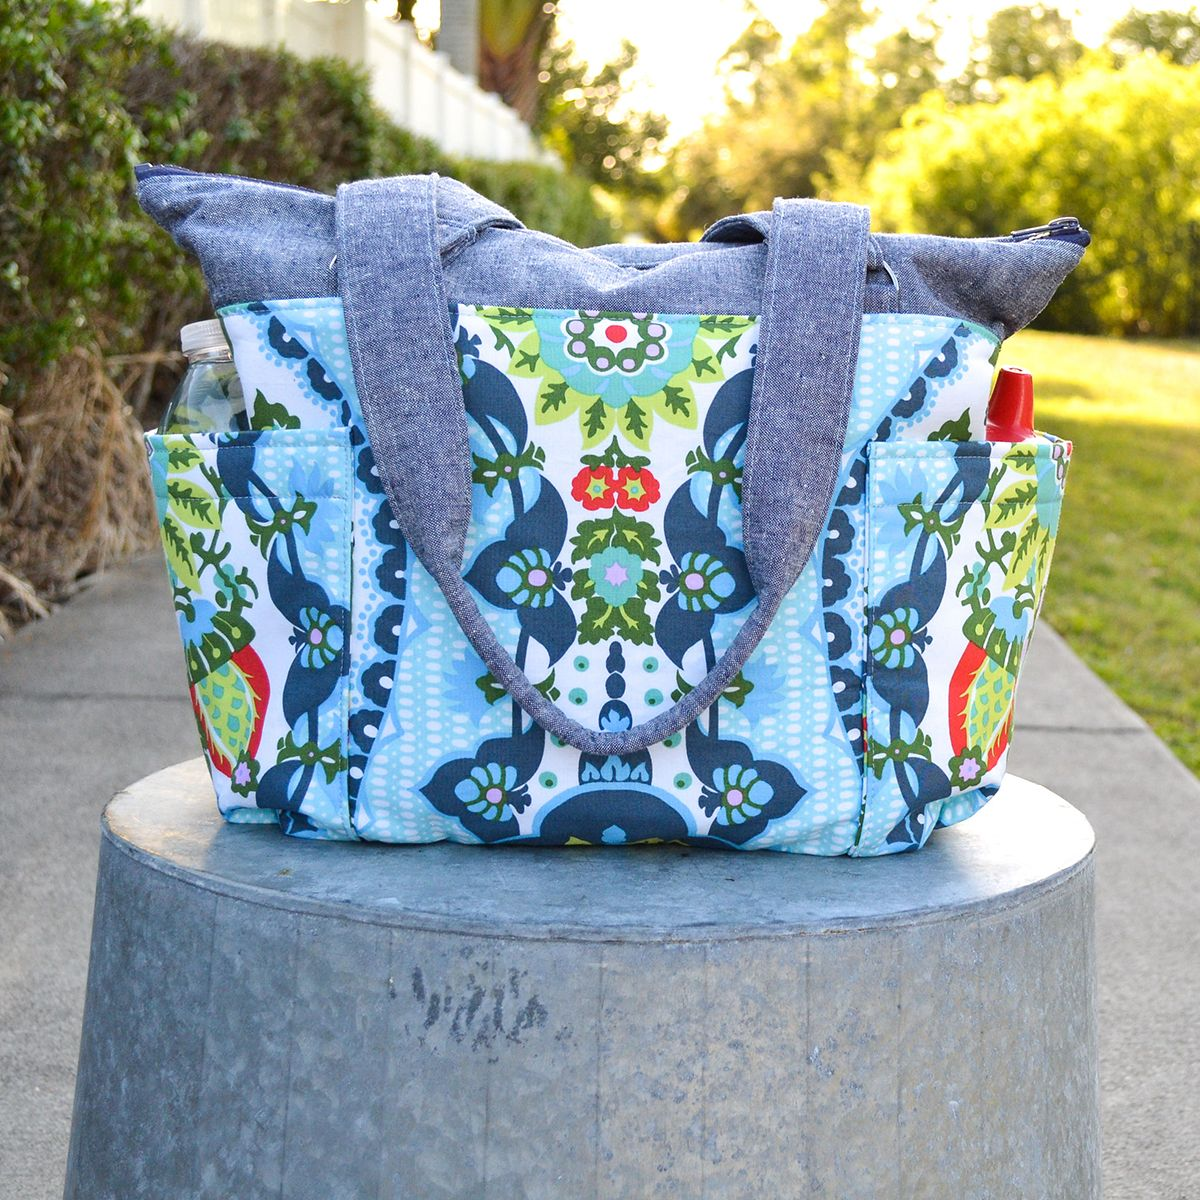 DIY Diaper Bag Tutorial | Taschen nähen, Schnittmuster und Nähen